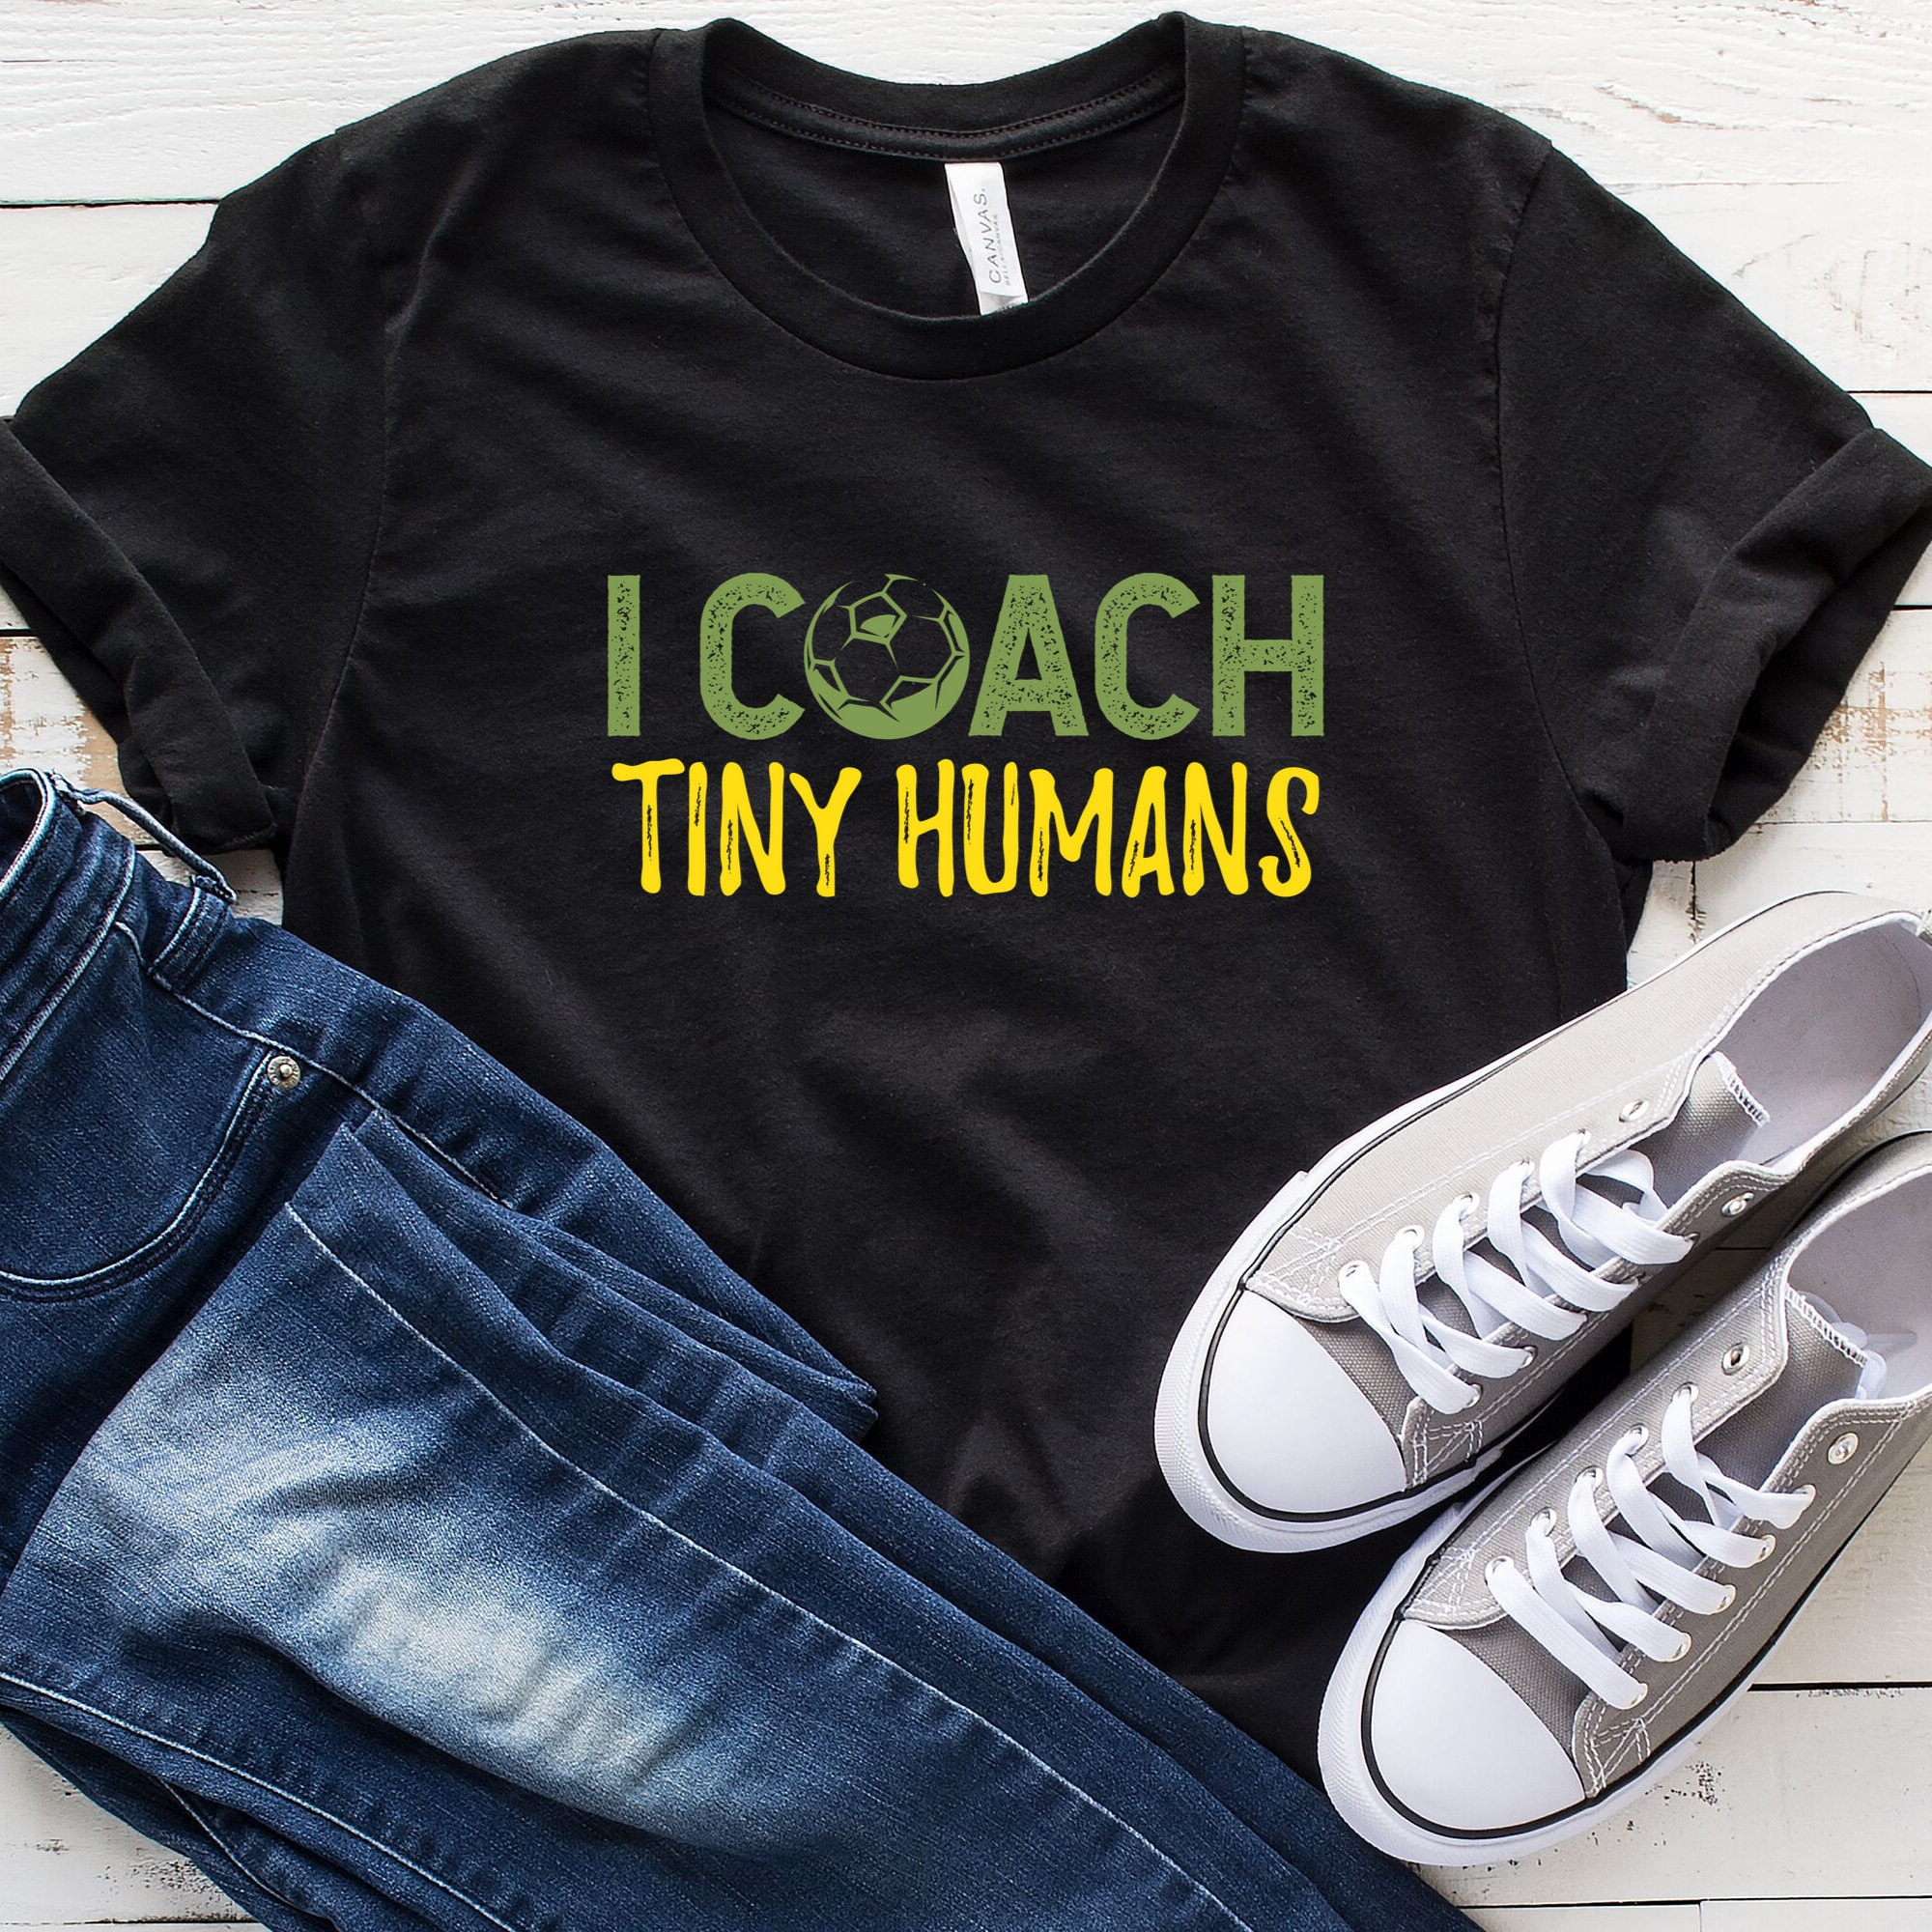 I Coach Tiny Humans T-shirt Soccer Mom Shirt Sports Mom Shirt Soccer Coach Shirt Funny Soccer Shirt Team Mom Gift Coach Gift Unisex Tshirt